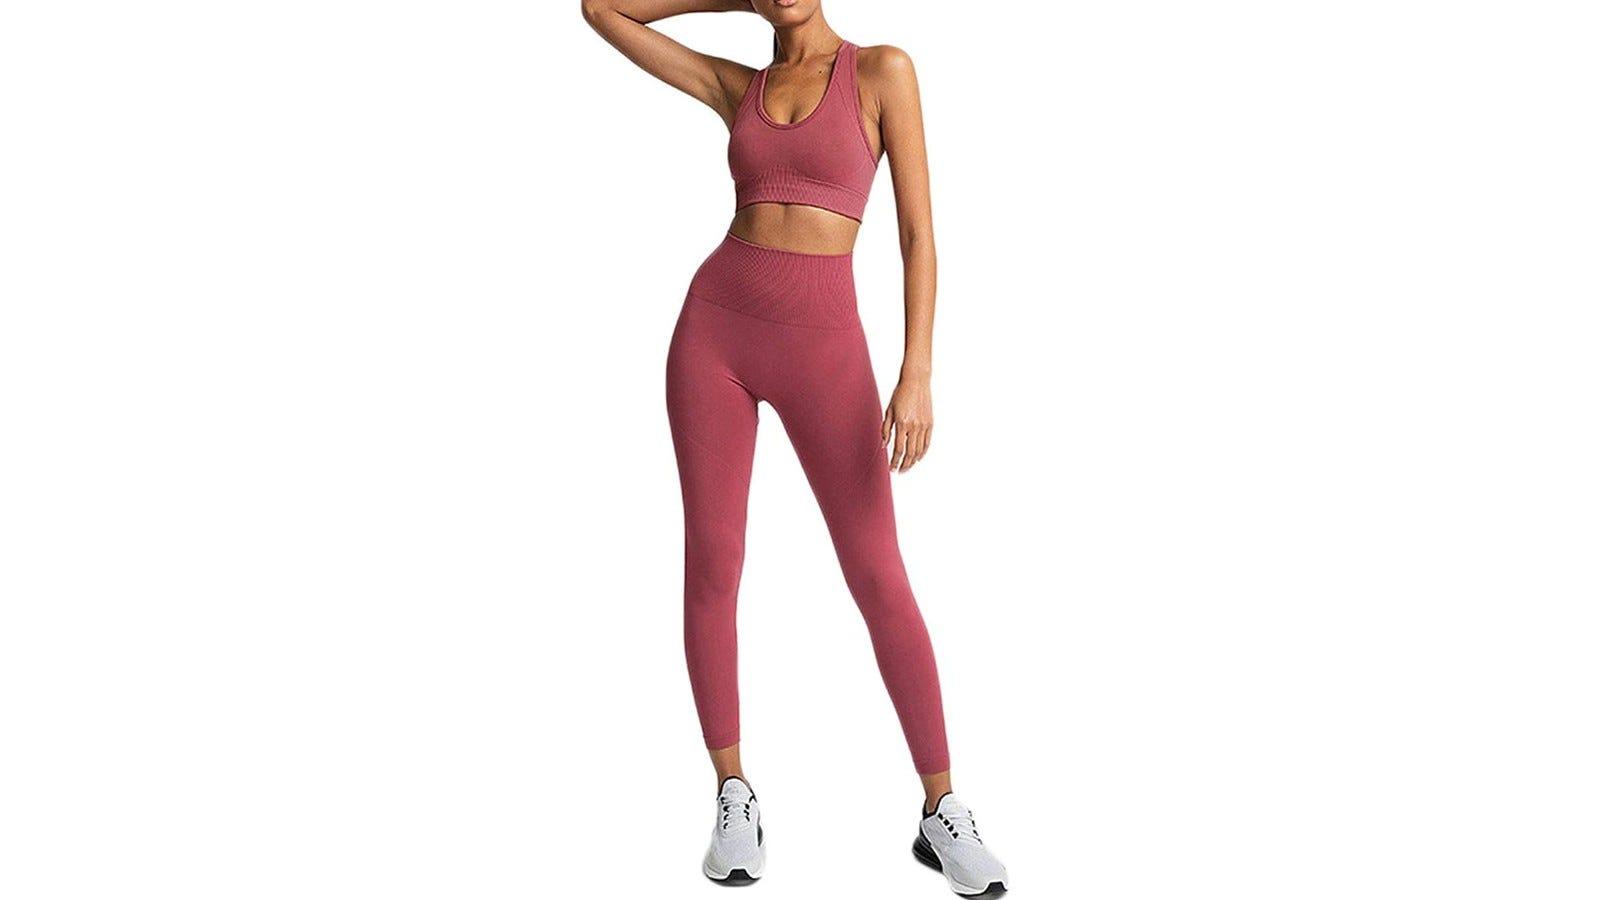 woman wearing coral activewear set